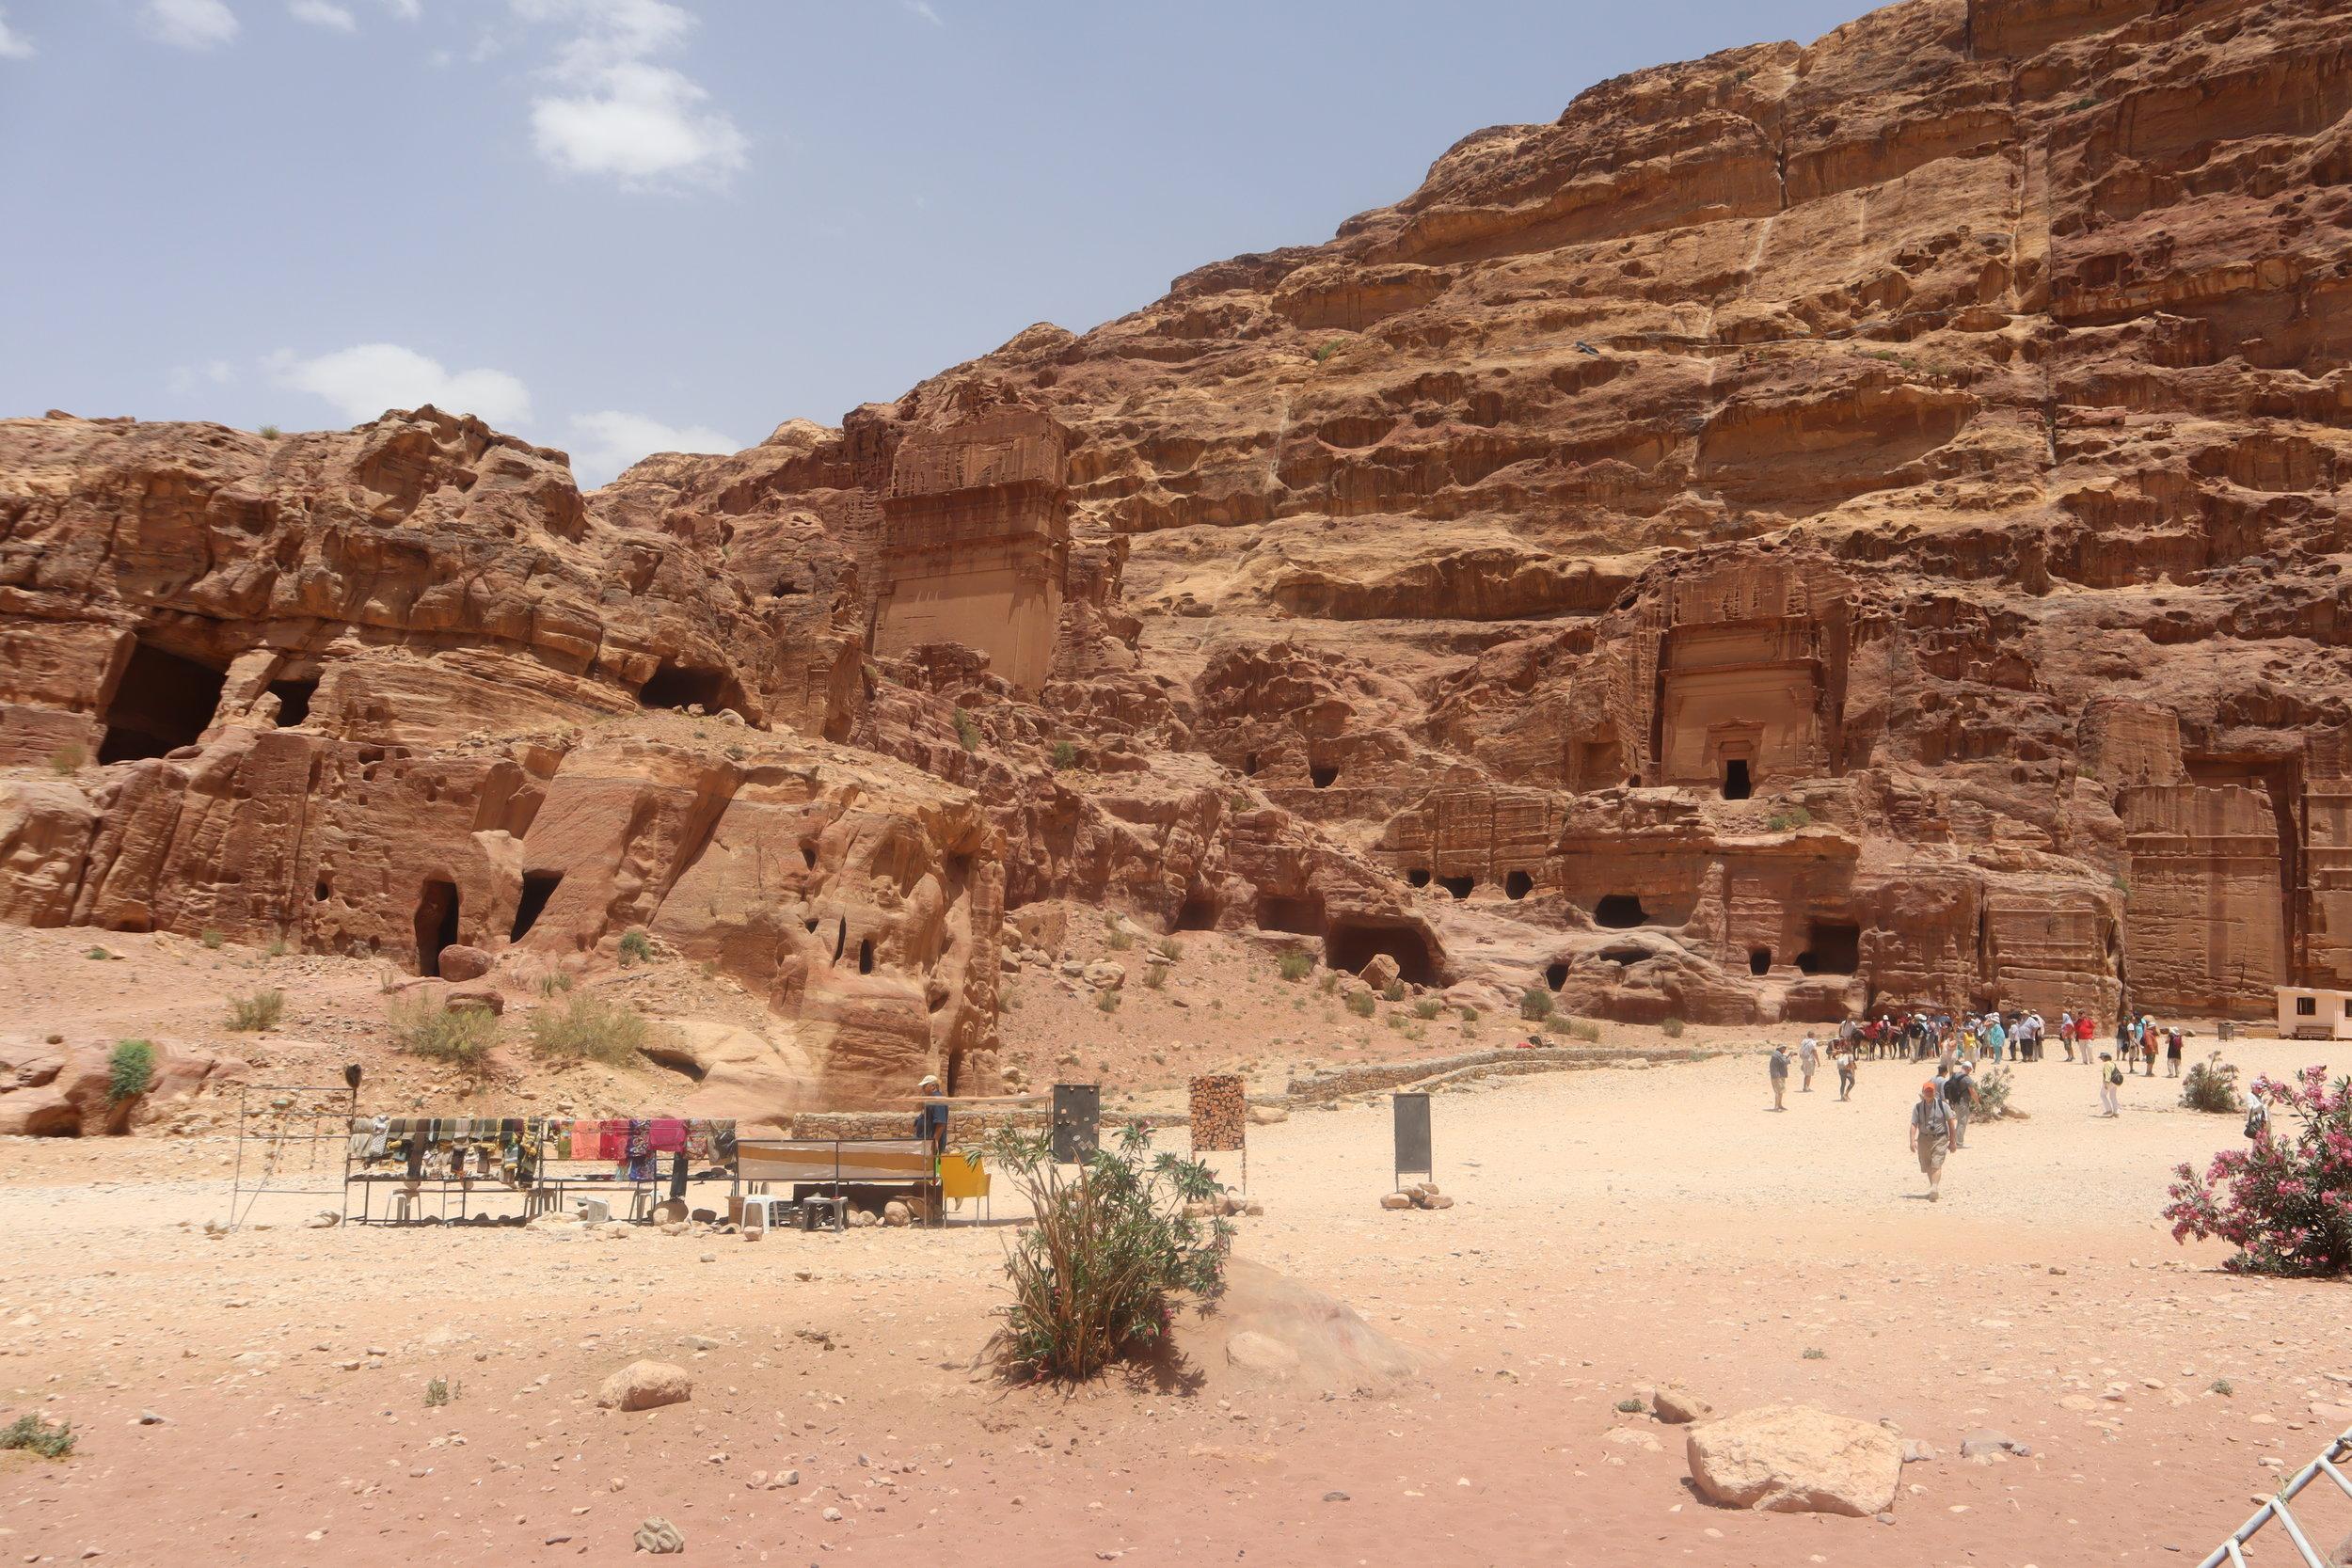 Petra, Jordan – Continuing along the trail